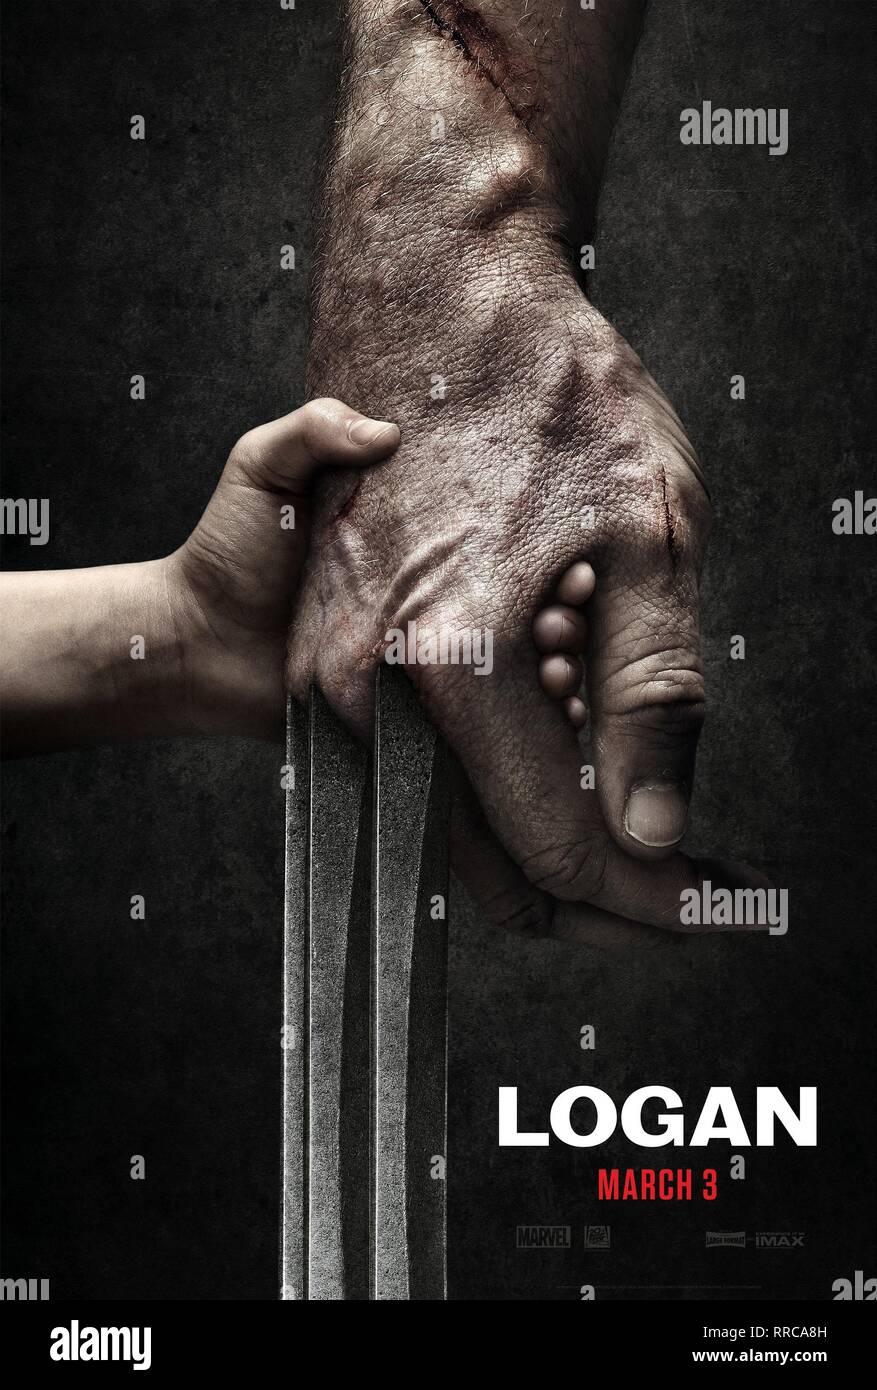 LOGAN, MOVIE POSTER, 2017 - Stock Image